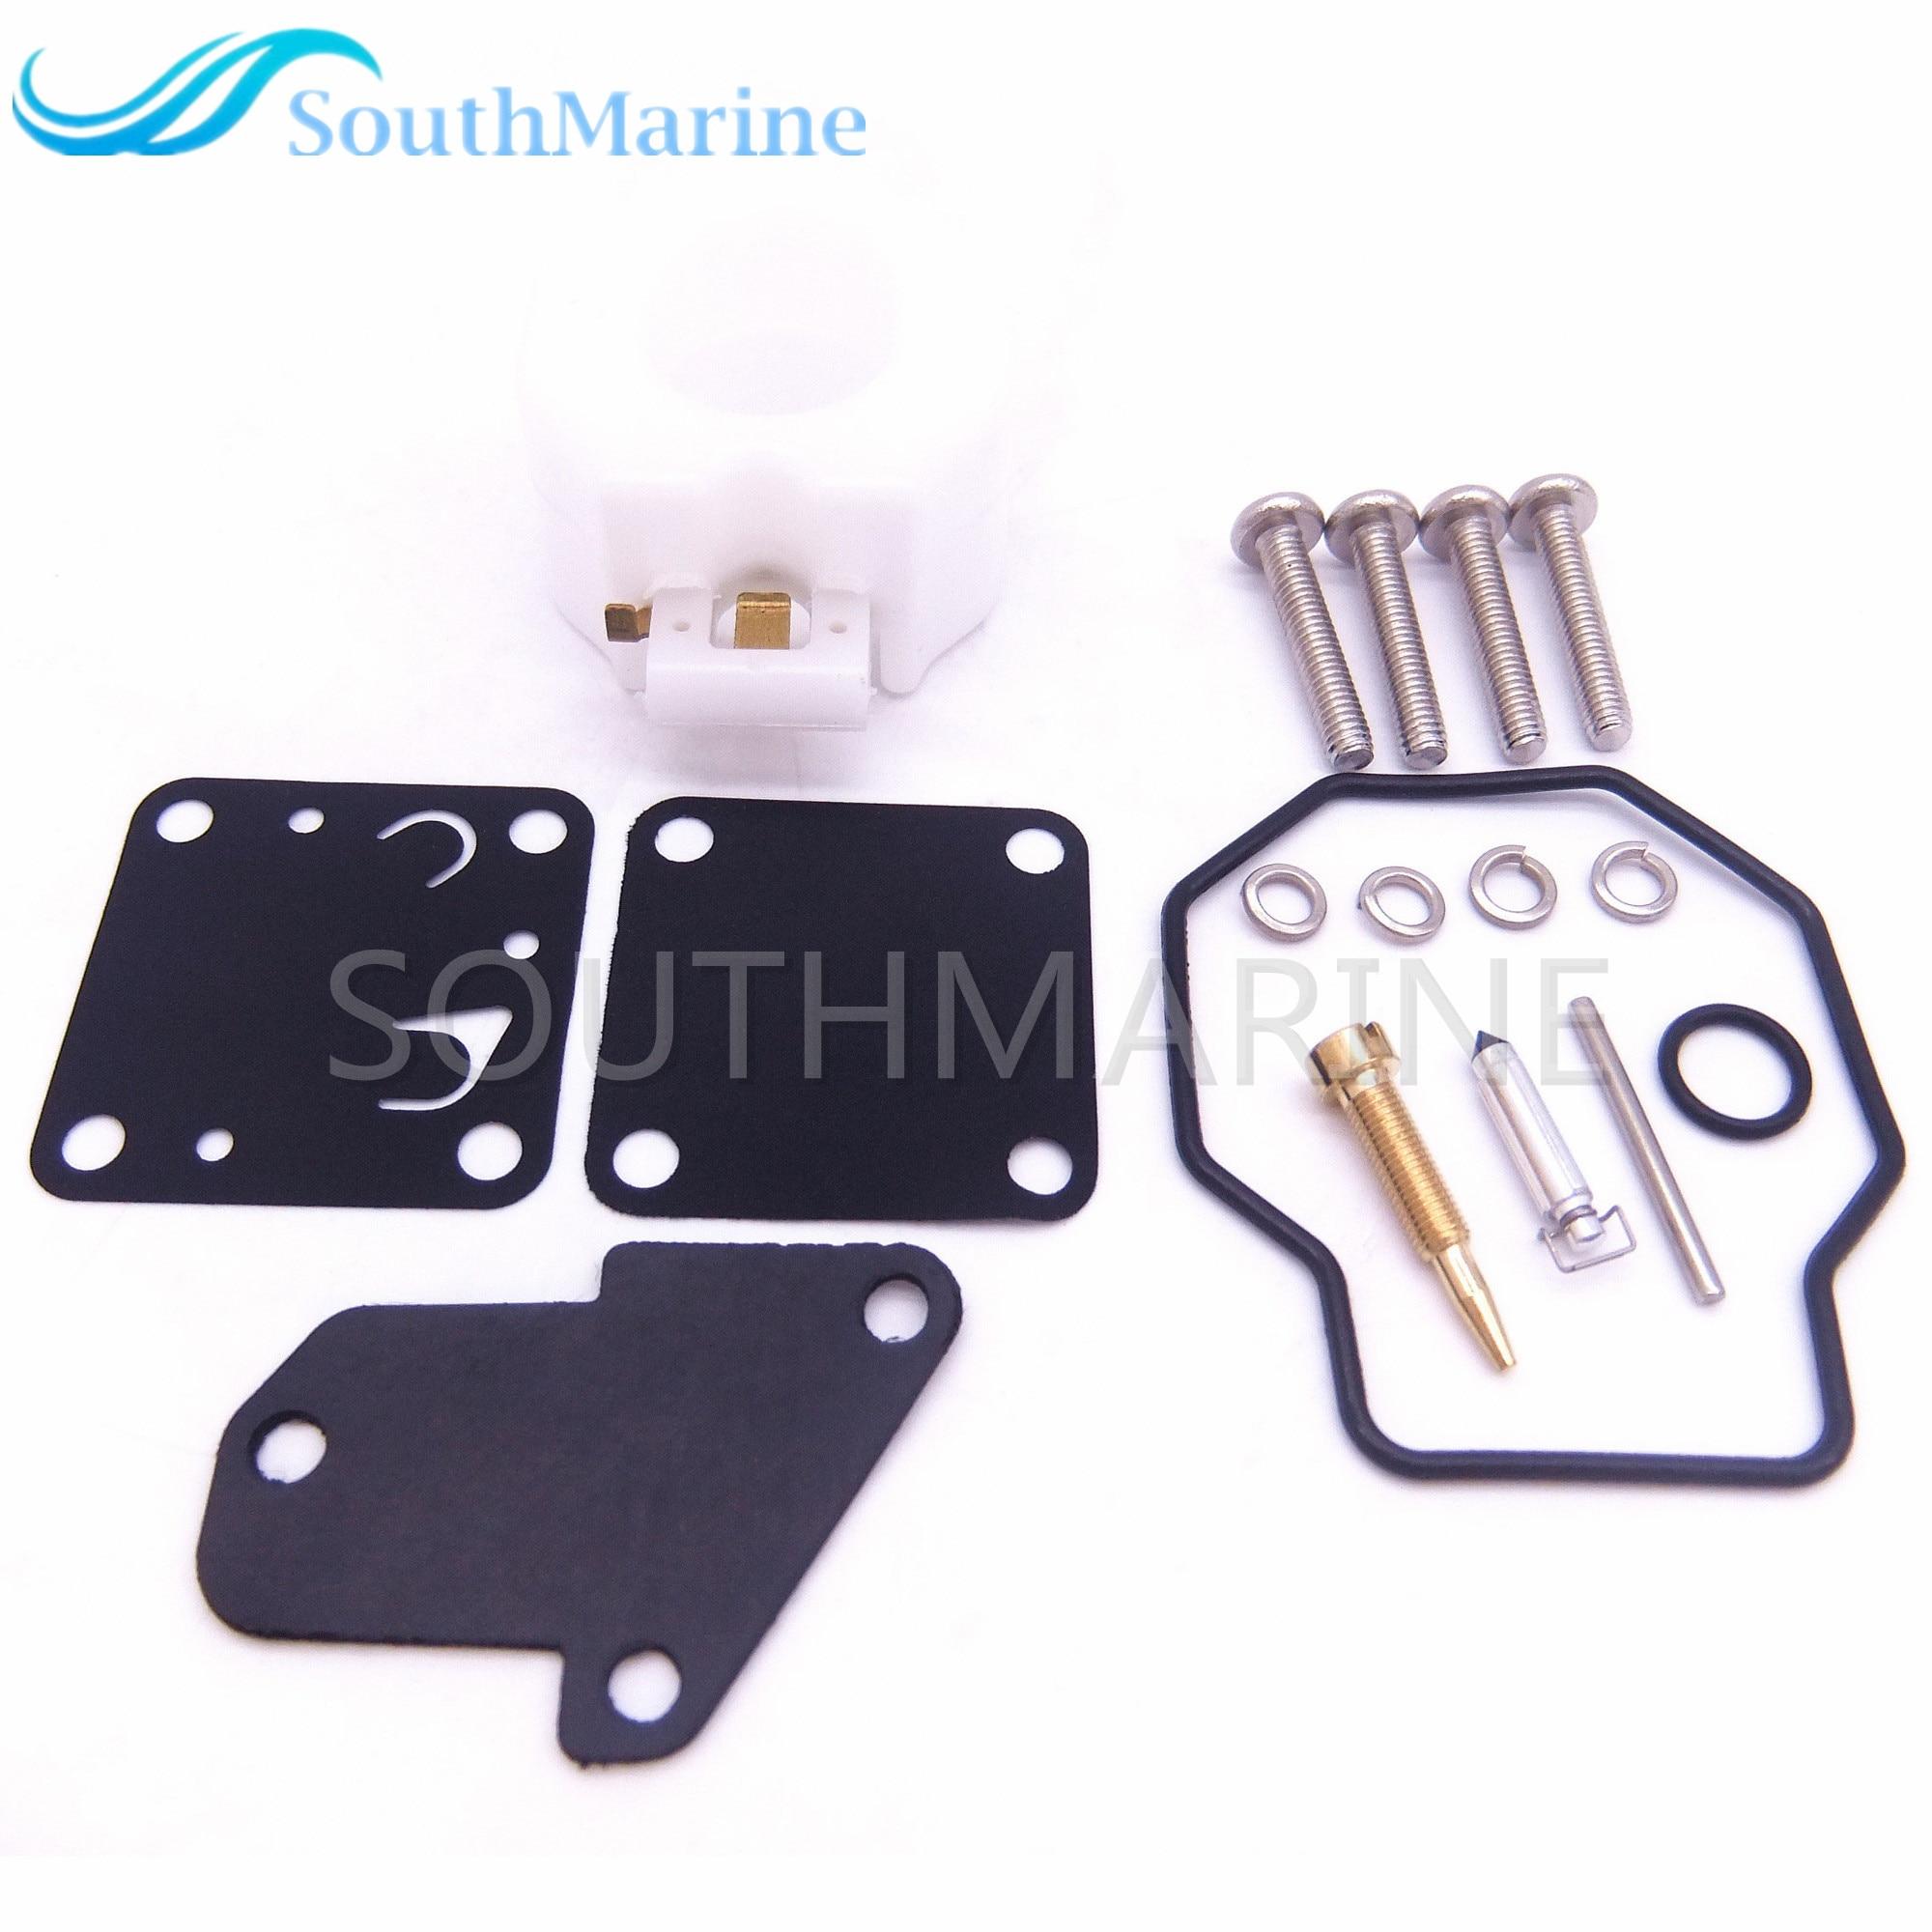 Boat Motor Carburetor Repair Kit 6E3-W0093 6E0-W0093 For Yamaha 4HP 5HP 4M 5M Outboard Engine